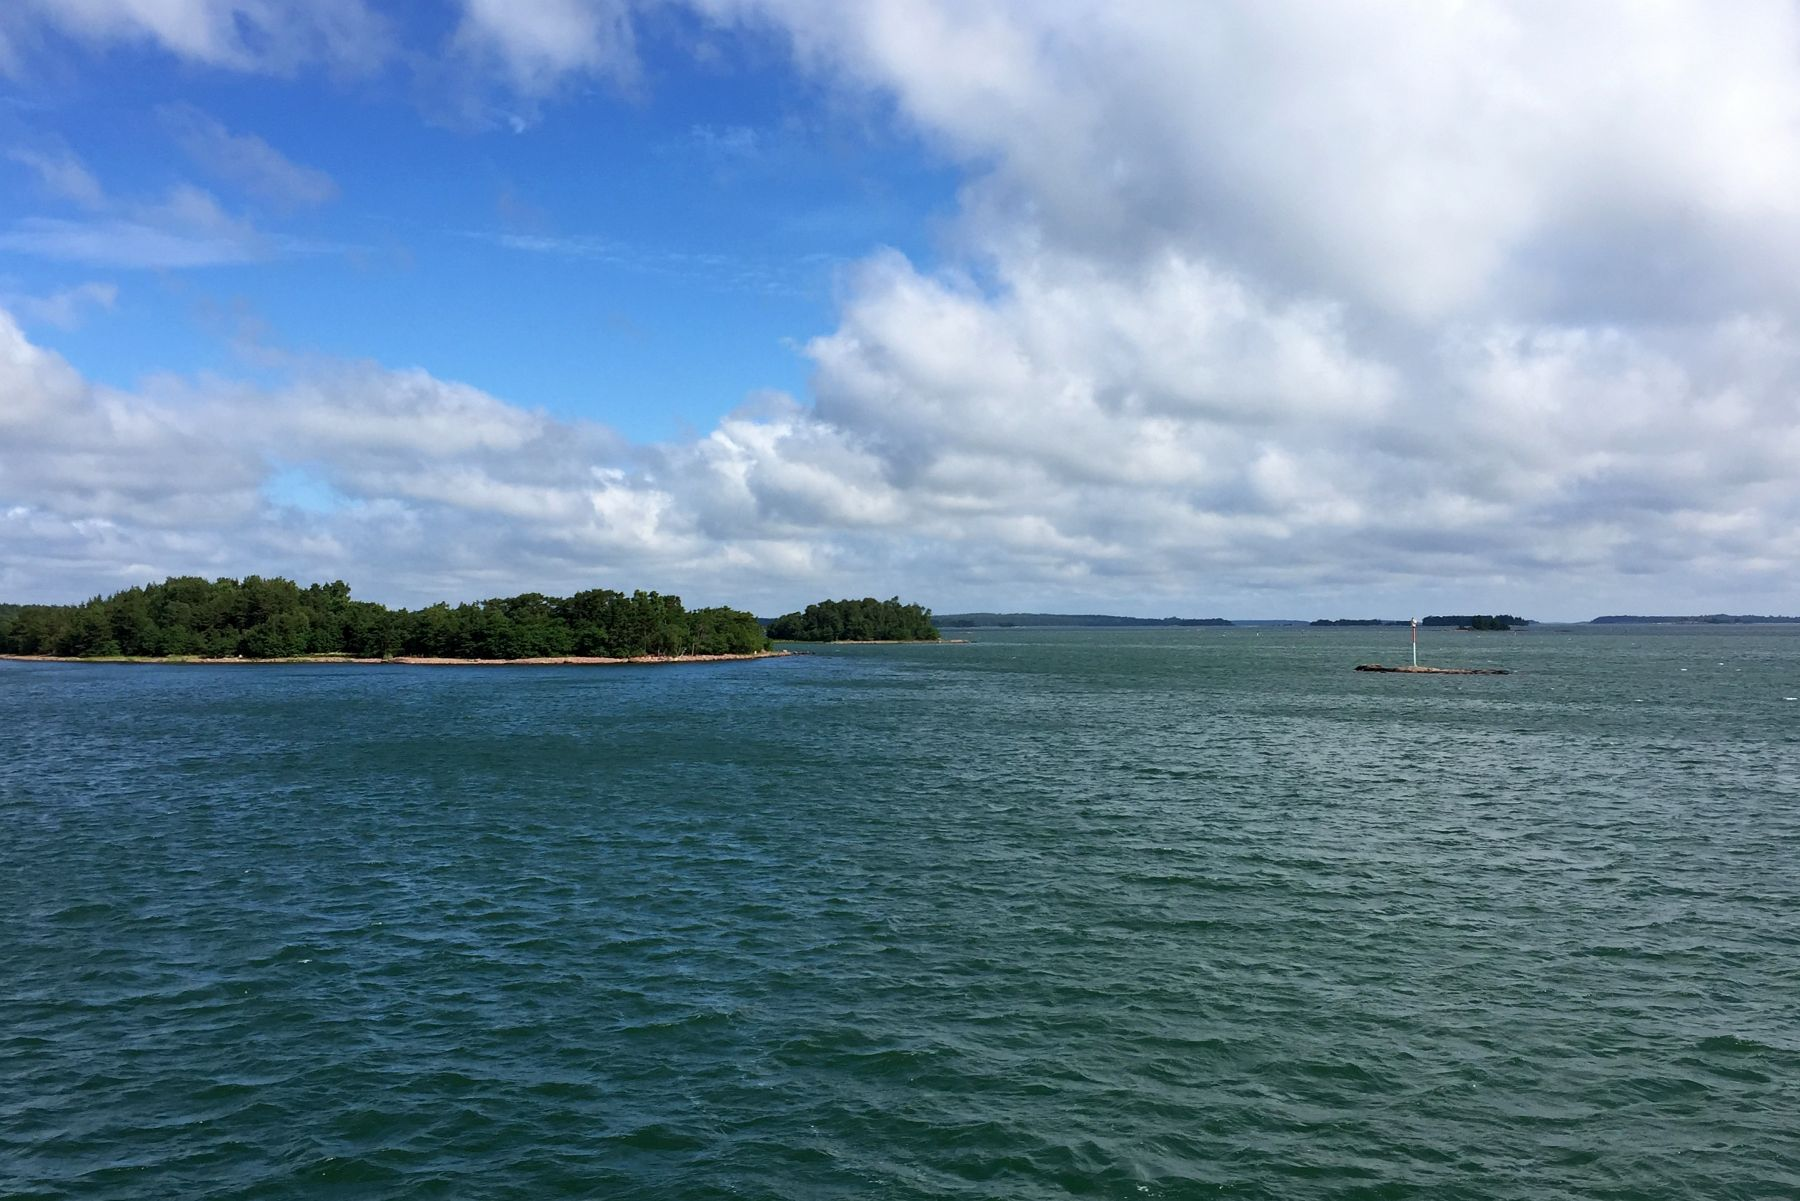 Ahvenanmaan saaristoa